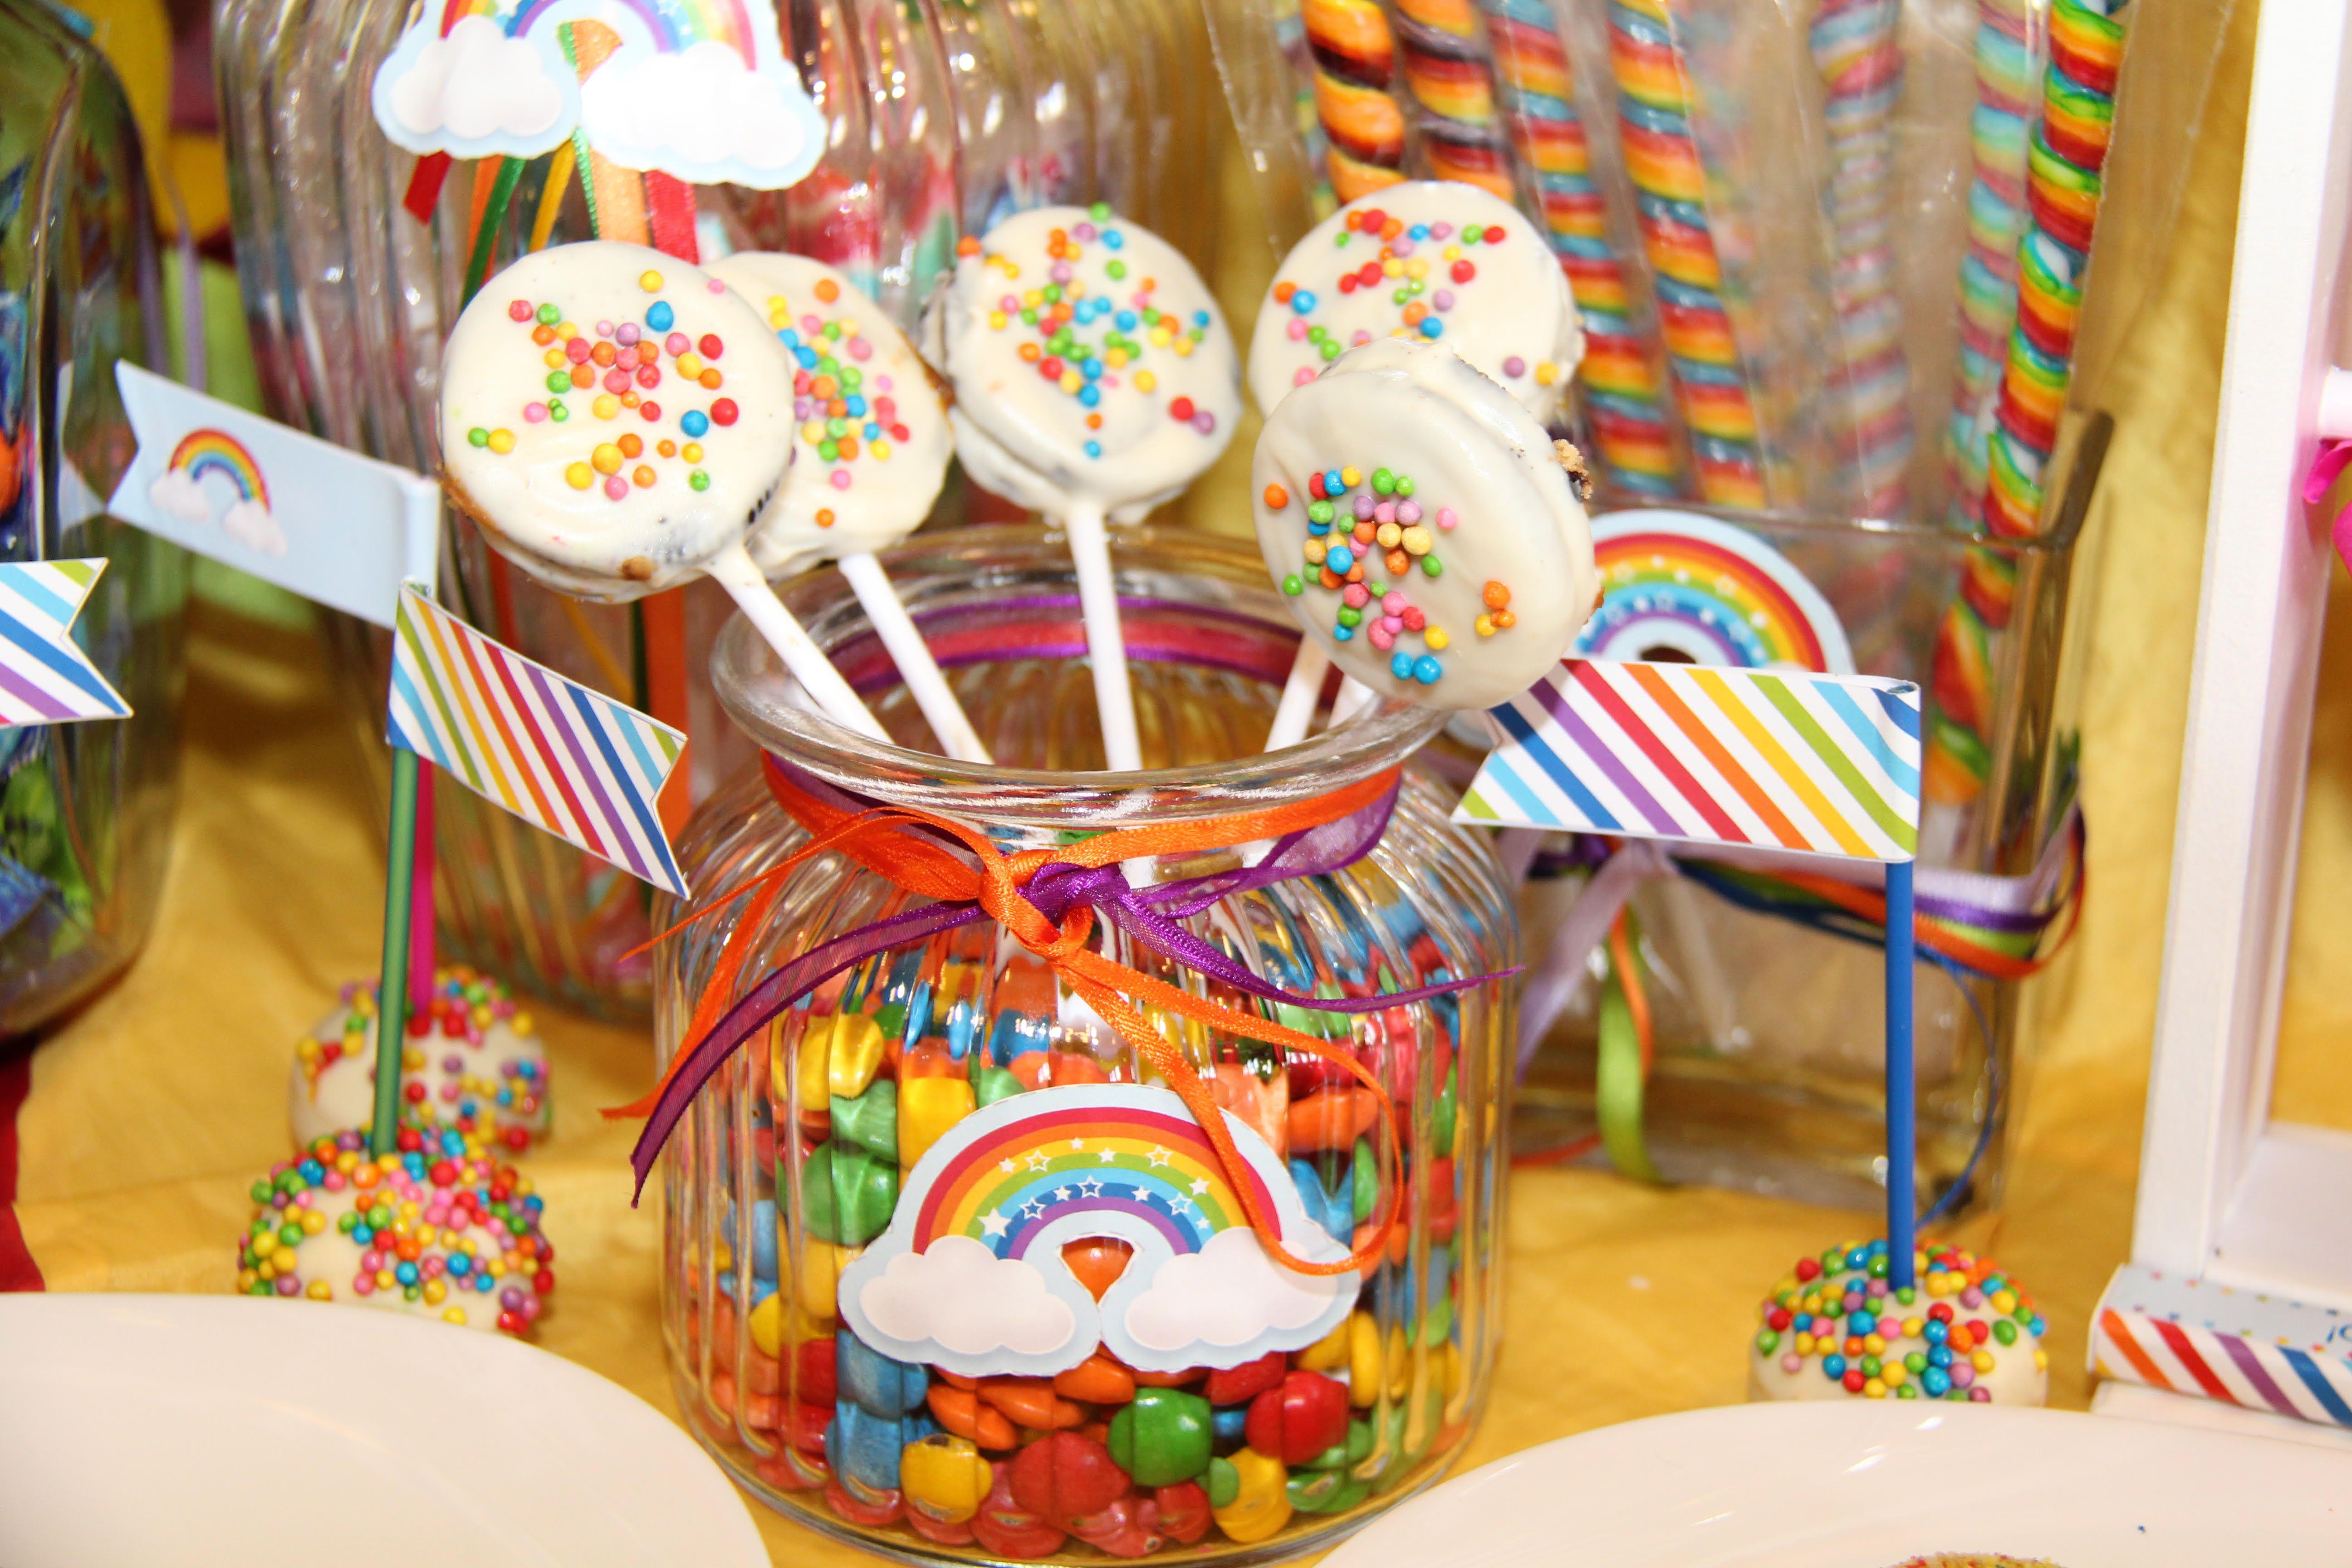 Cosas ricas mesa dulce decorada con Kit Imprimible Arco Iris